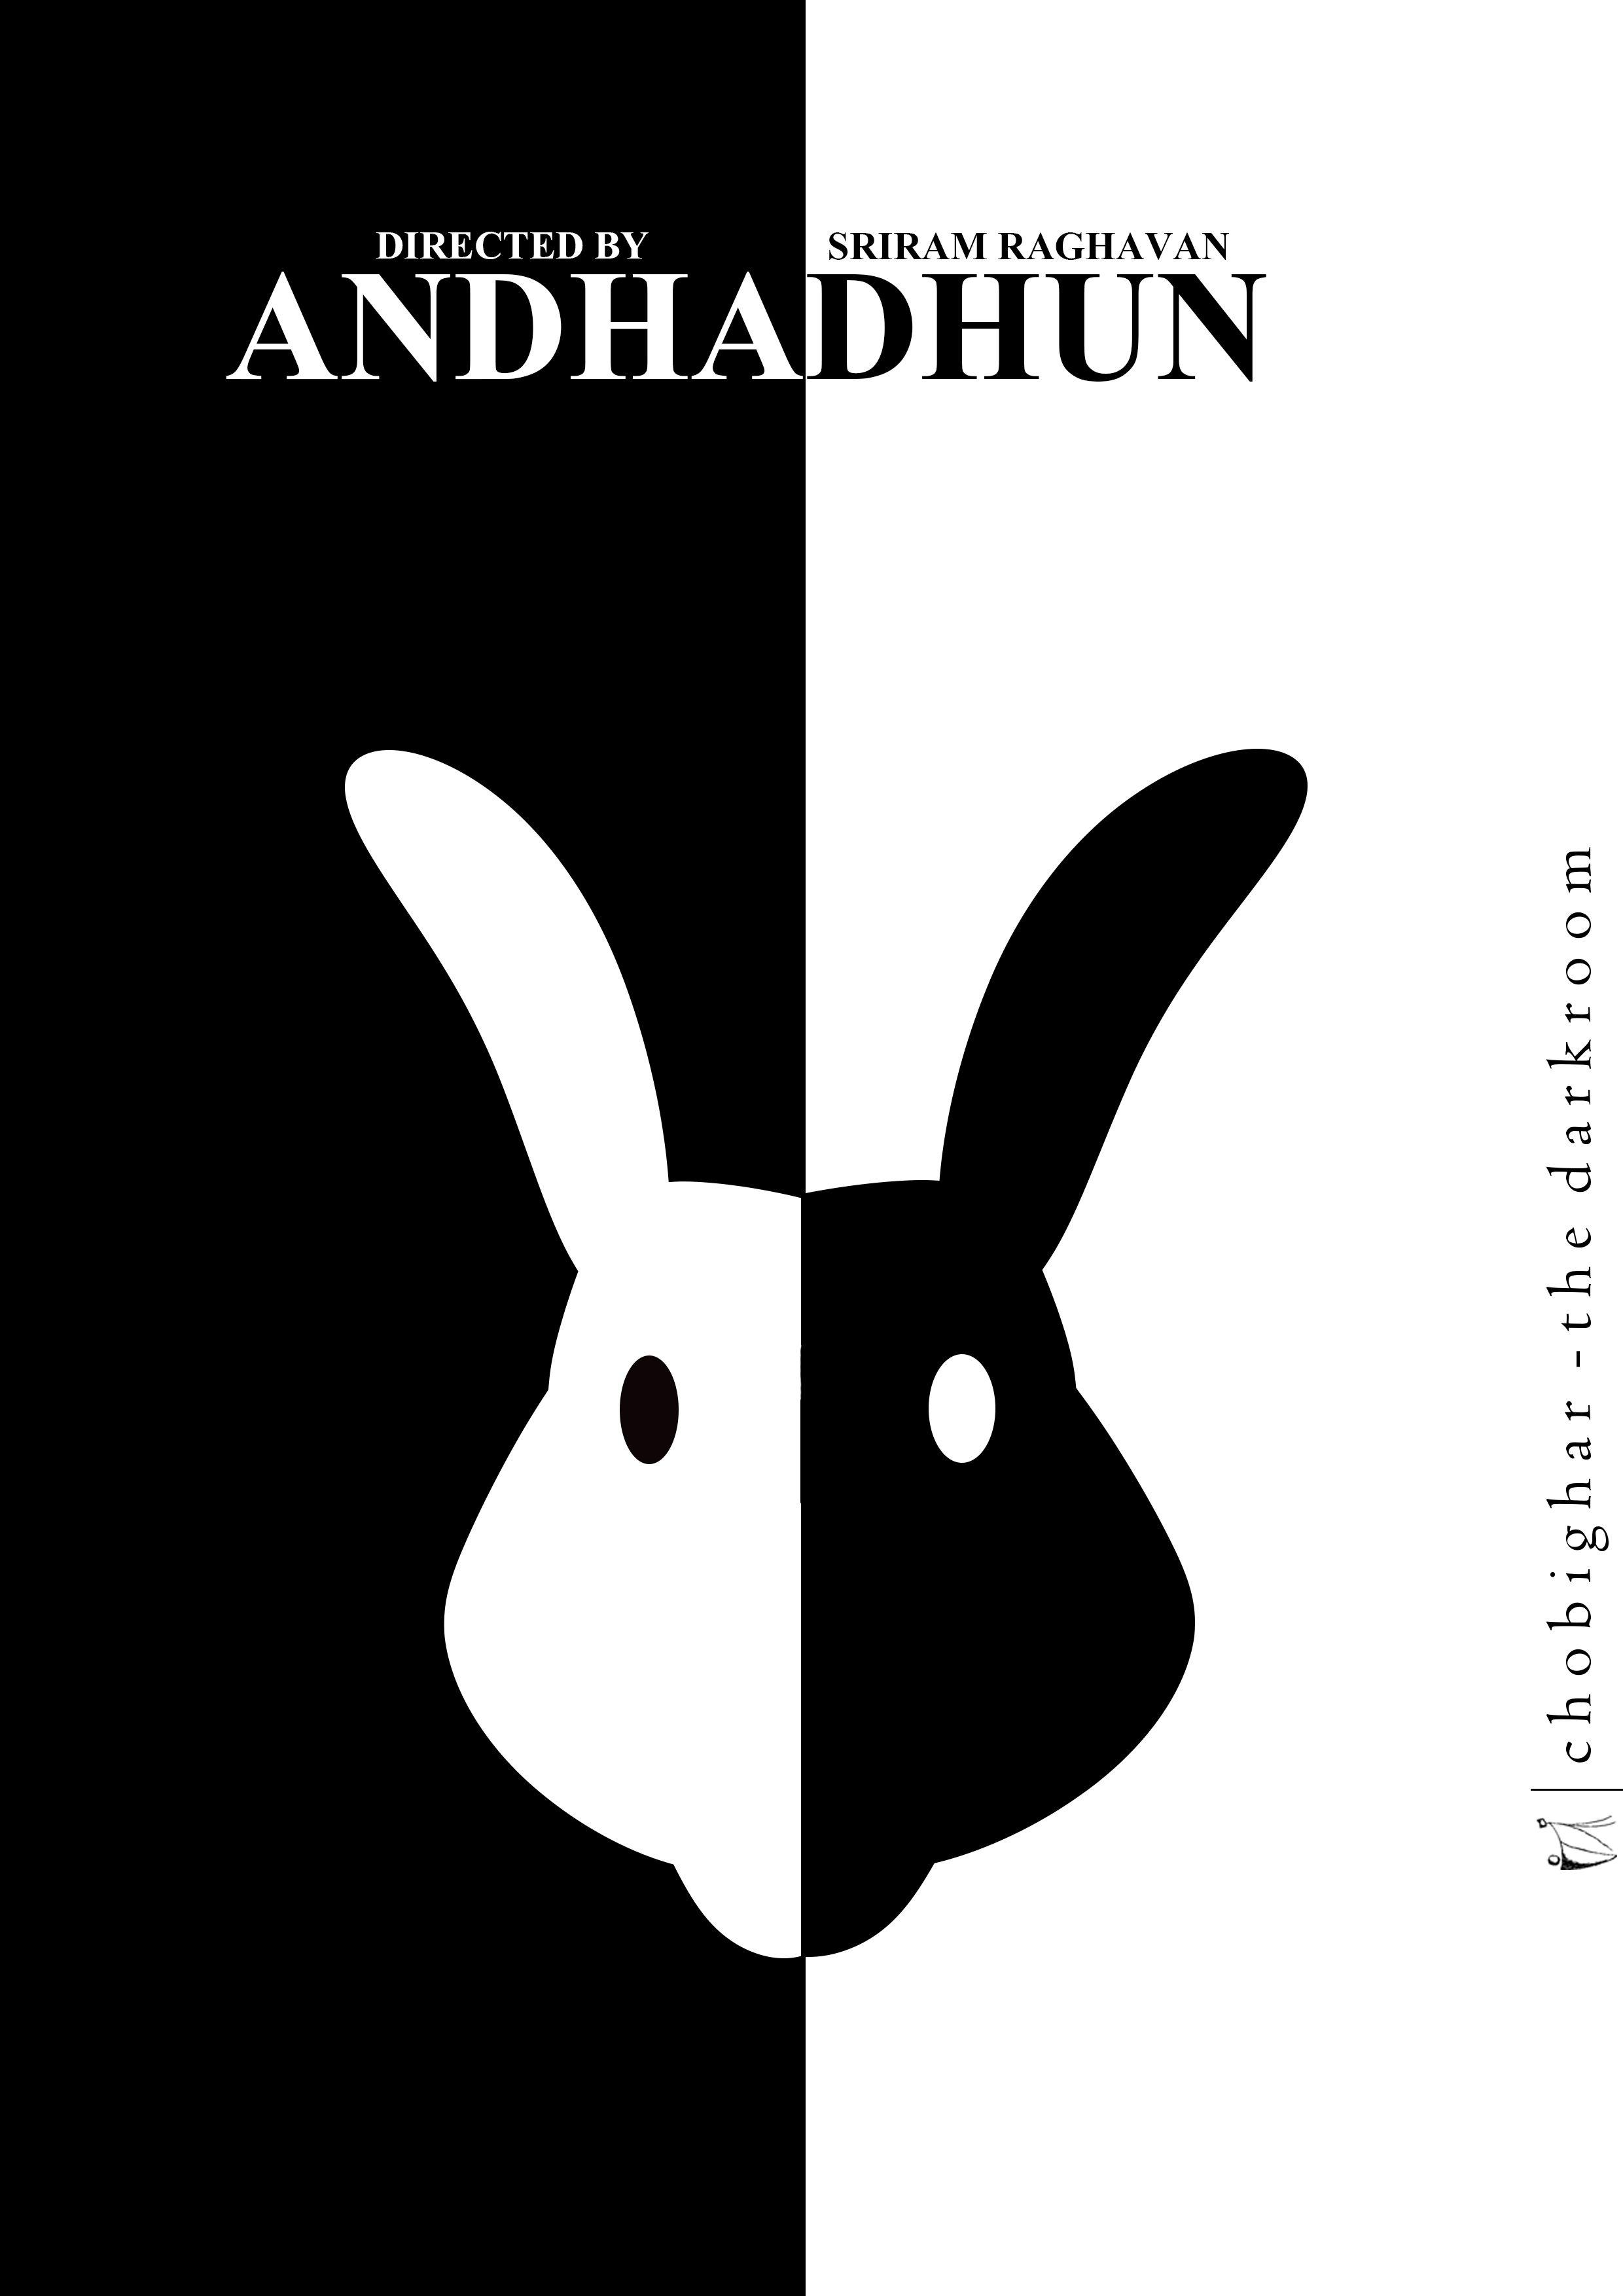 Andhadhun 2018 Movie Posters Minimalist Bollywood Posters Movie Posters